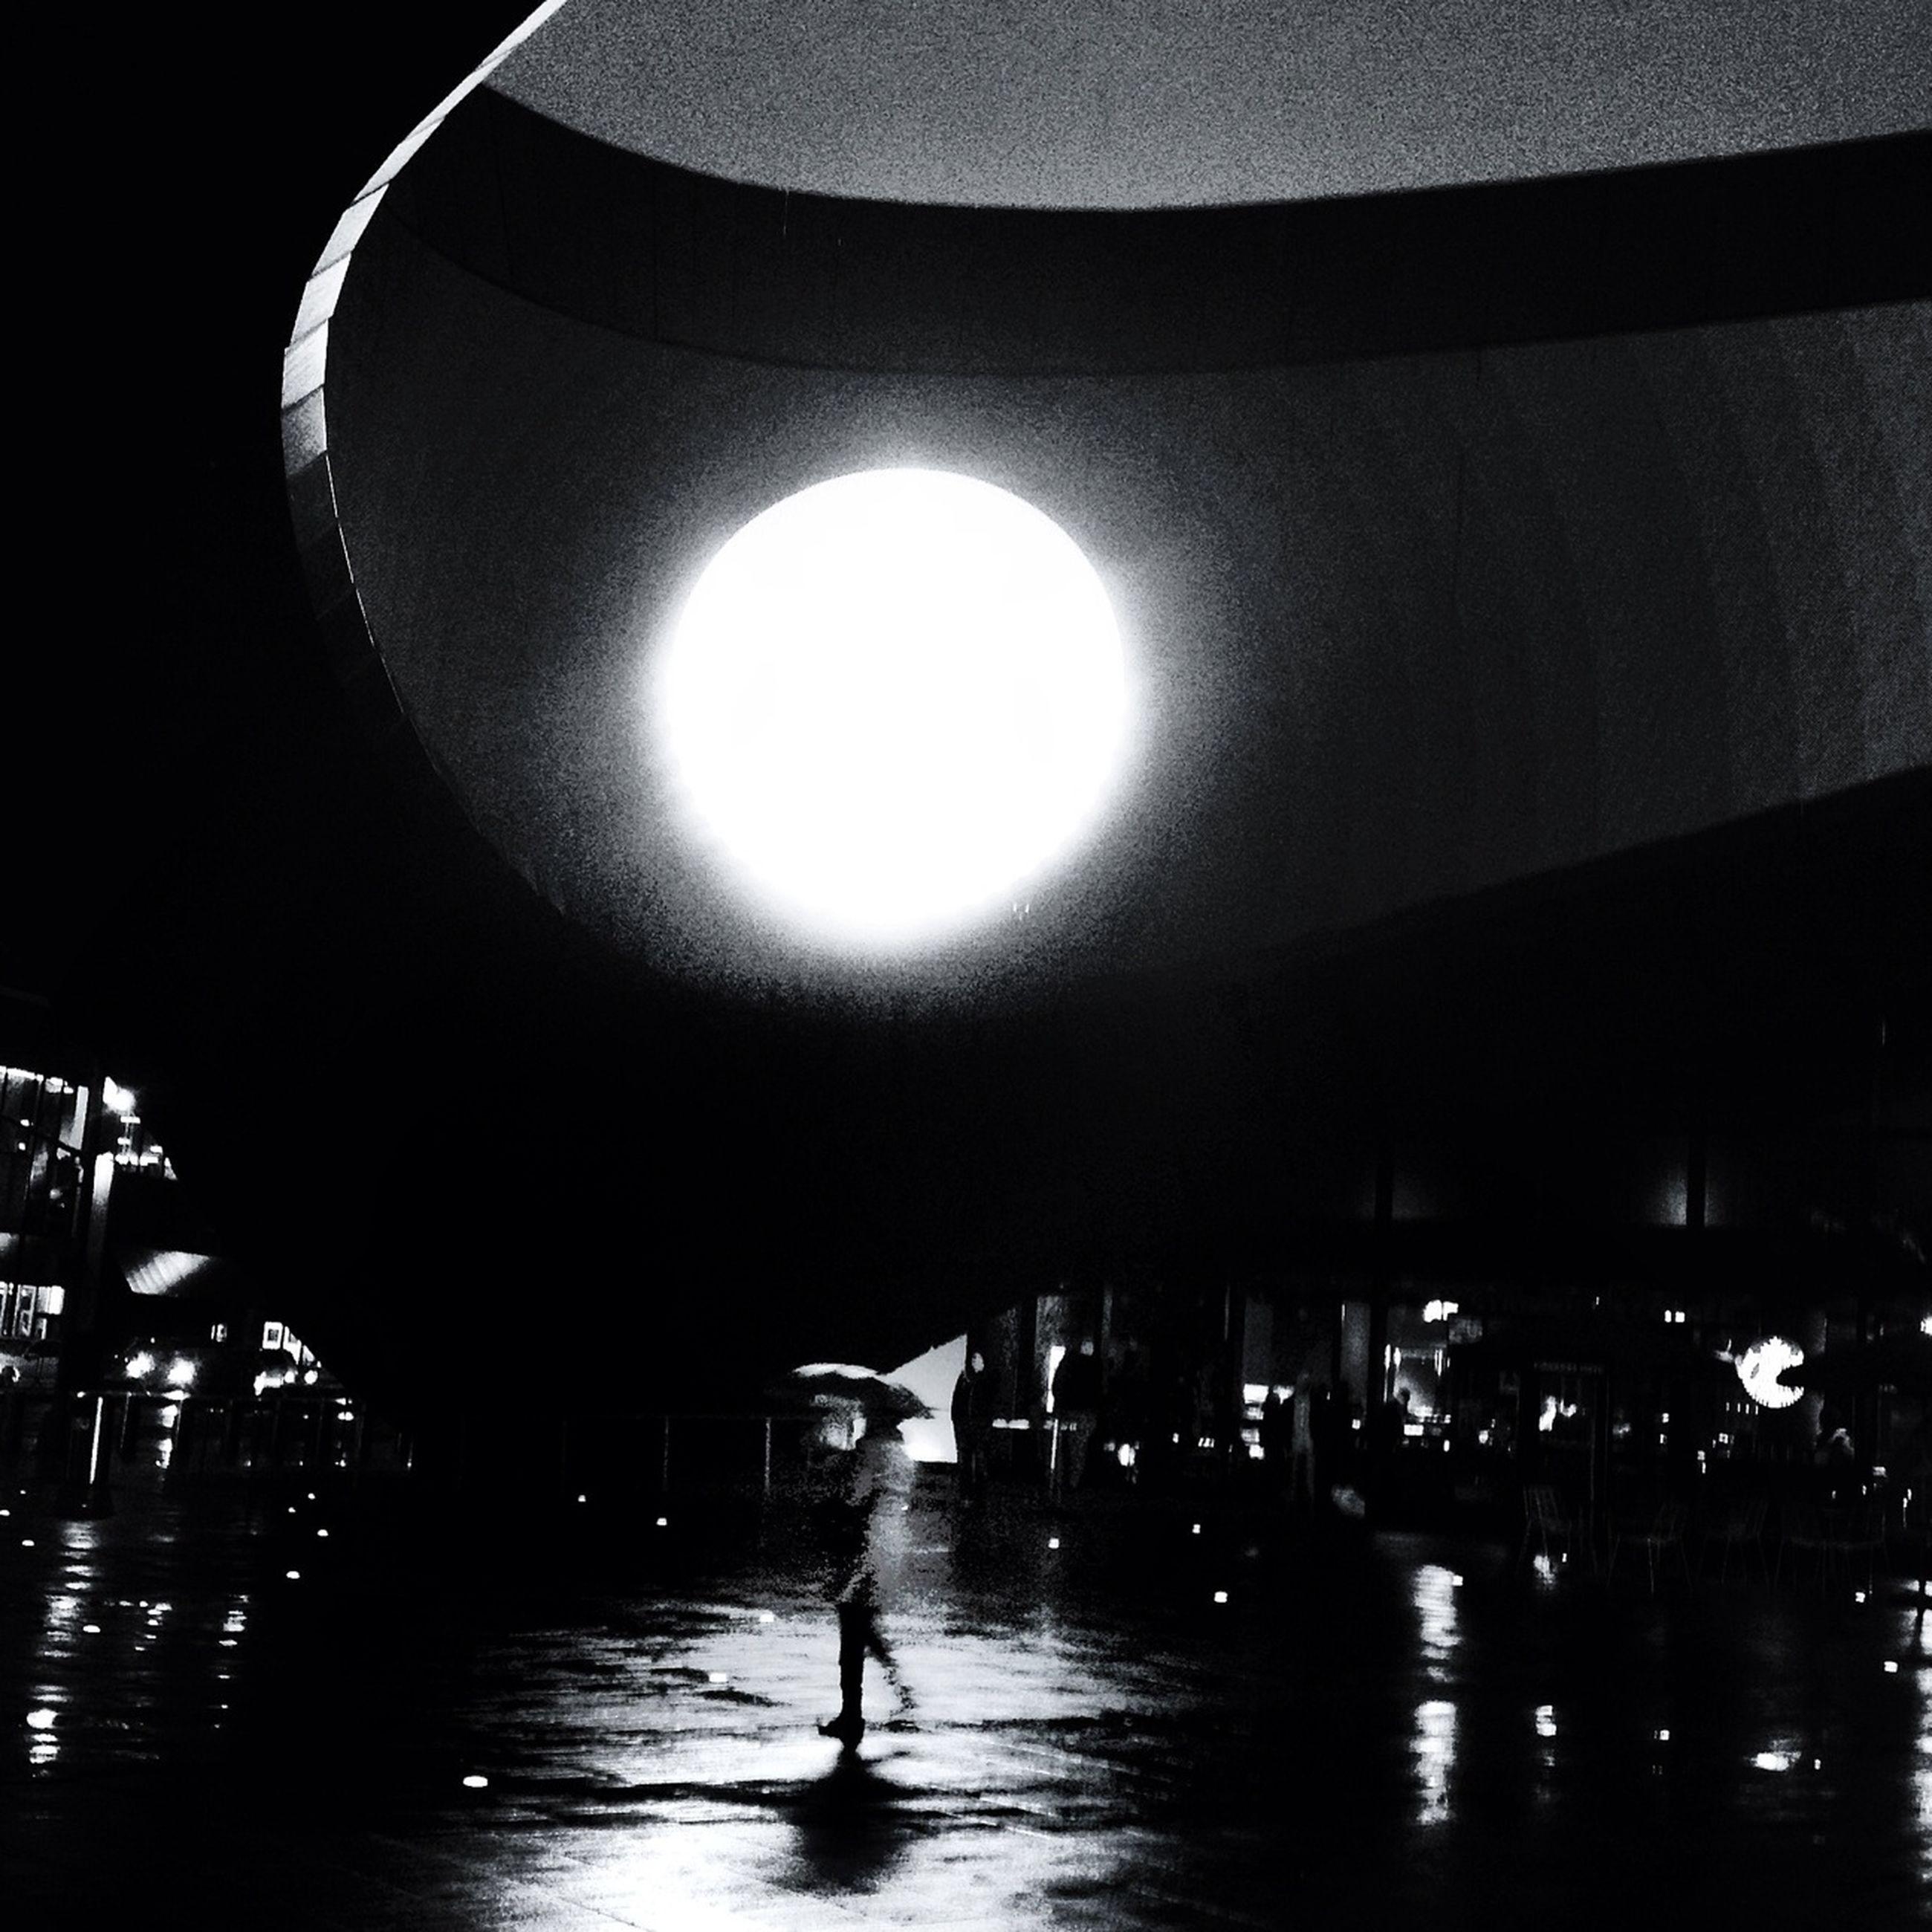 illuminated, lighting equipment, night, indoors, lifestyles, built structure, architecture, men, walking, reflection, leisure activity, city life, transportation, full length, city, person, street light, electric light